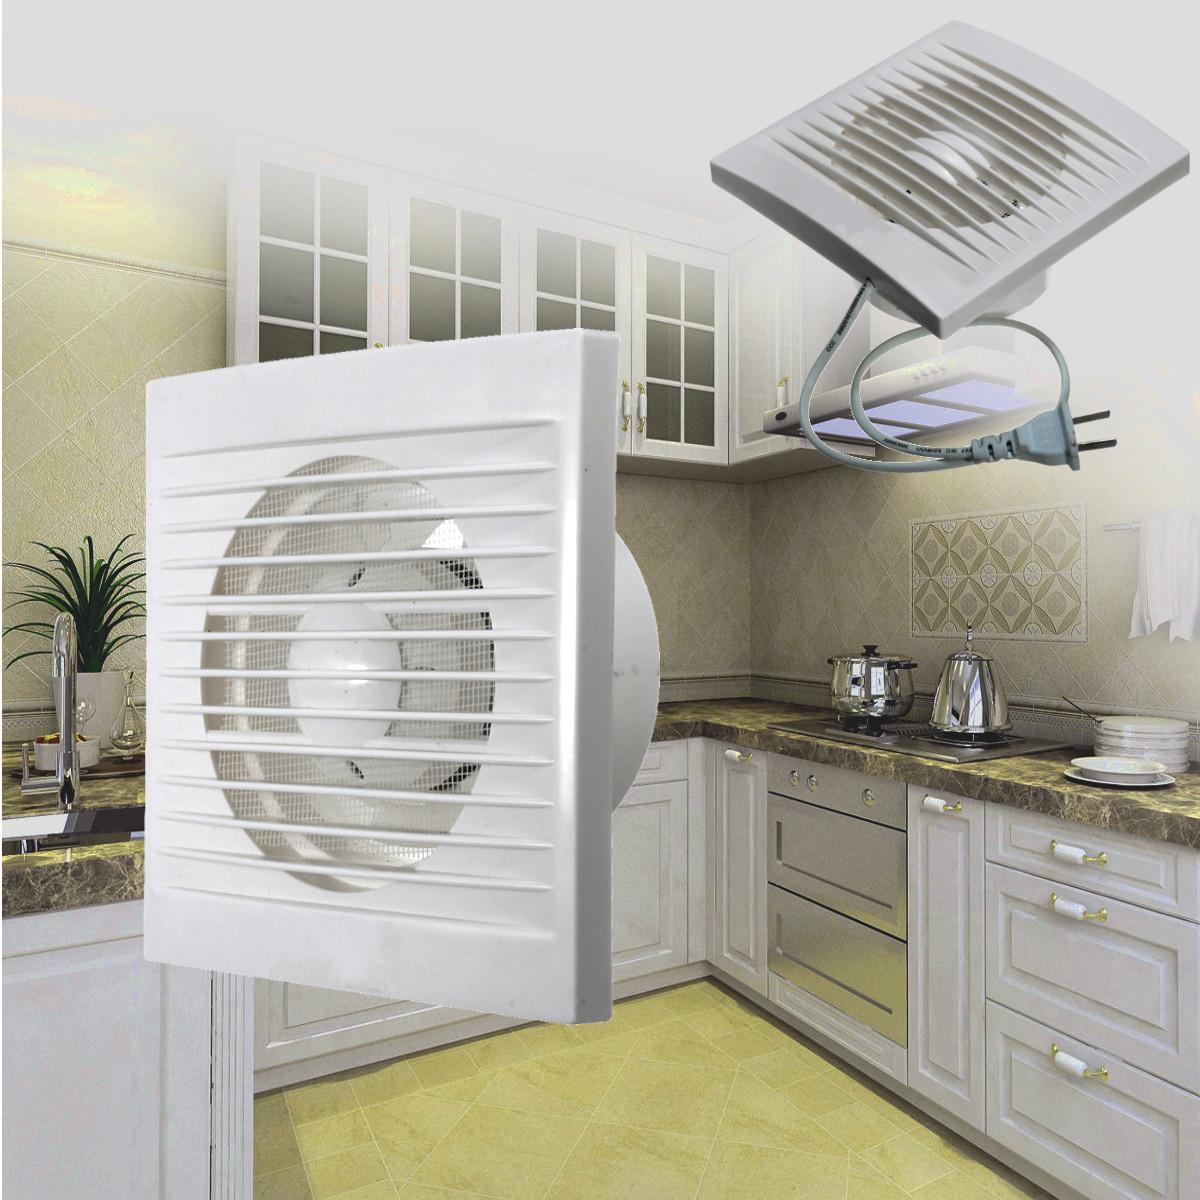 Online get cheap ventilateur mural salle de bains alibaba g - Ventilateur mural salle de bain ...